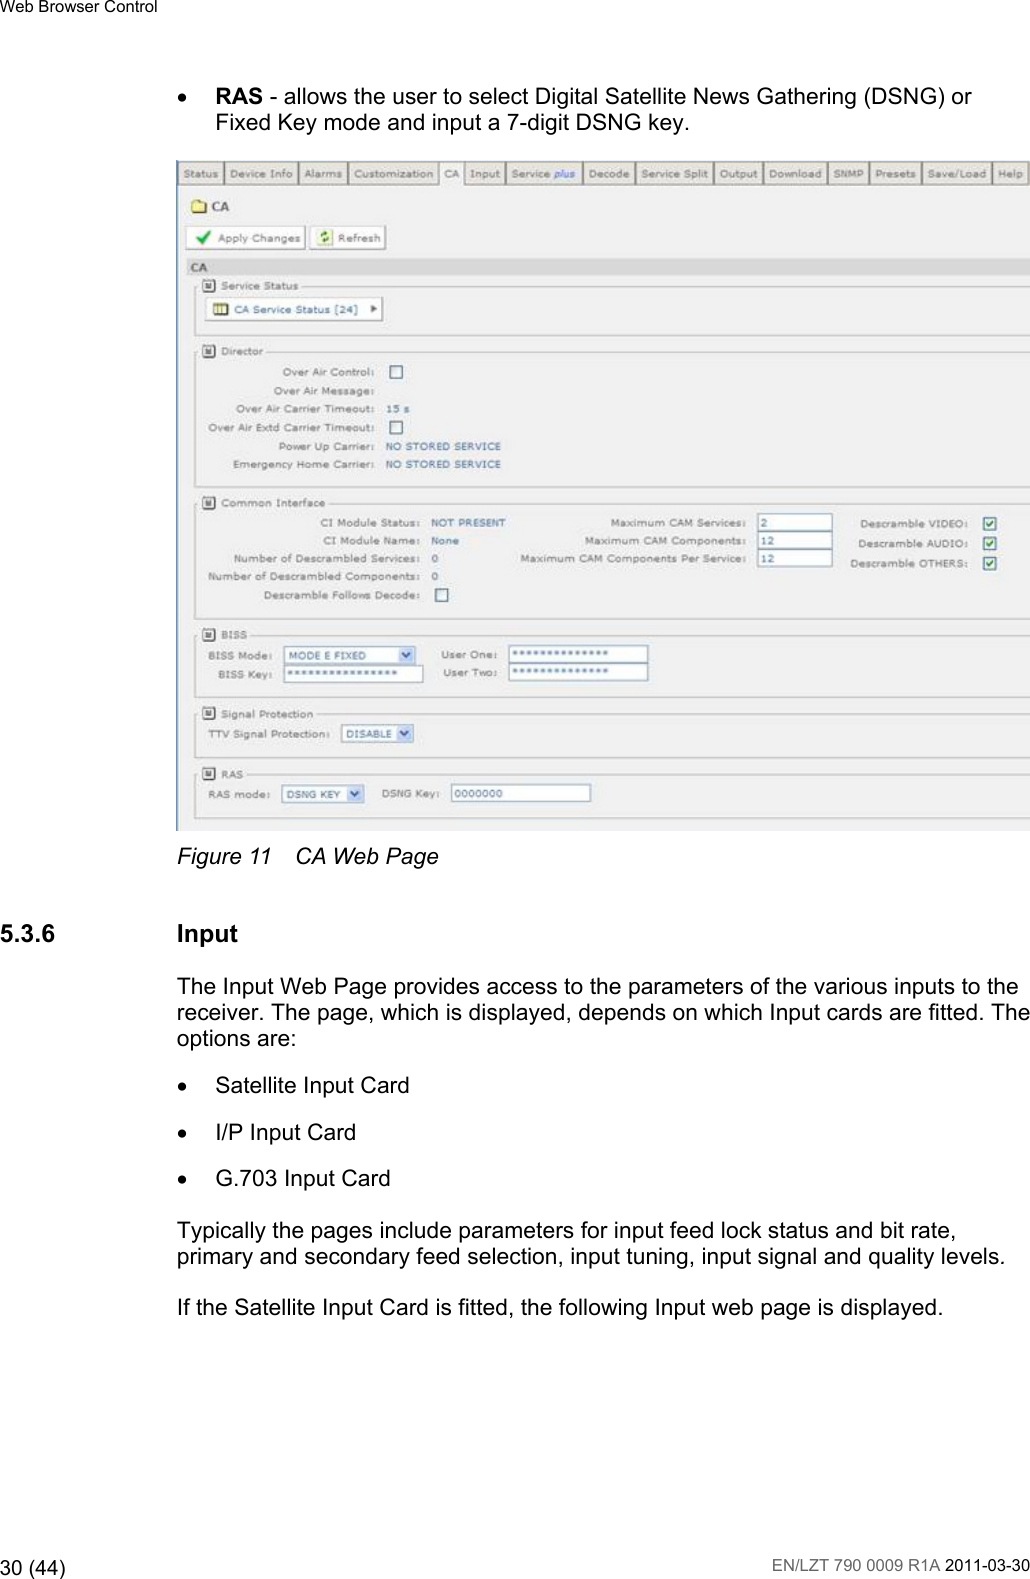 Ericsson Rx8200 Users Manual Advanced Modular Receiver